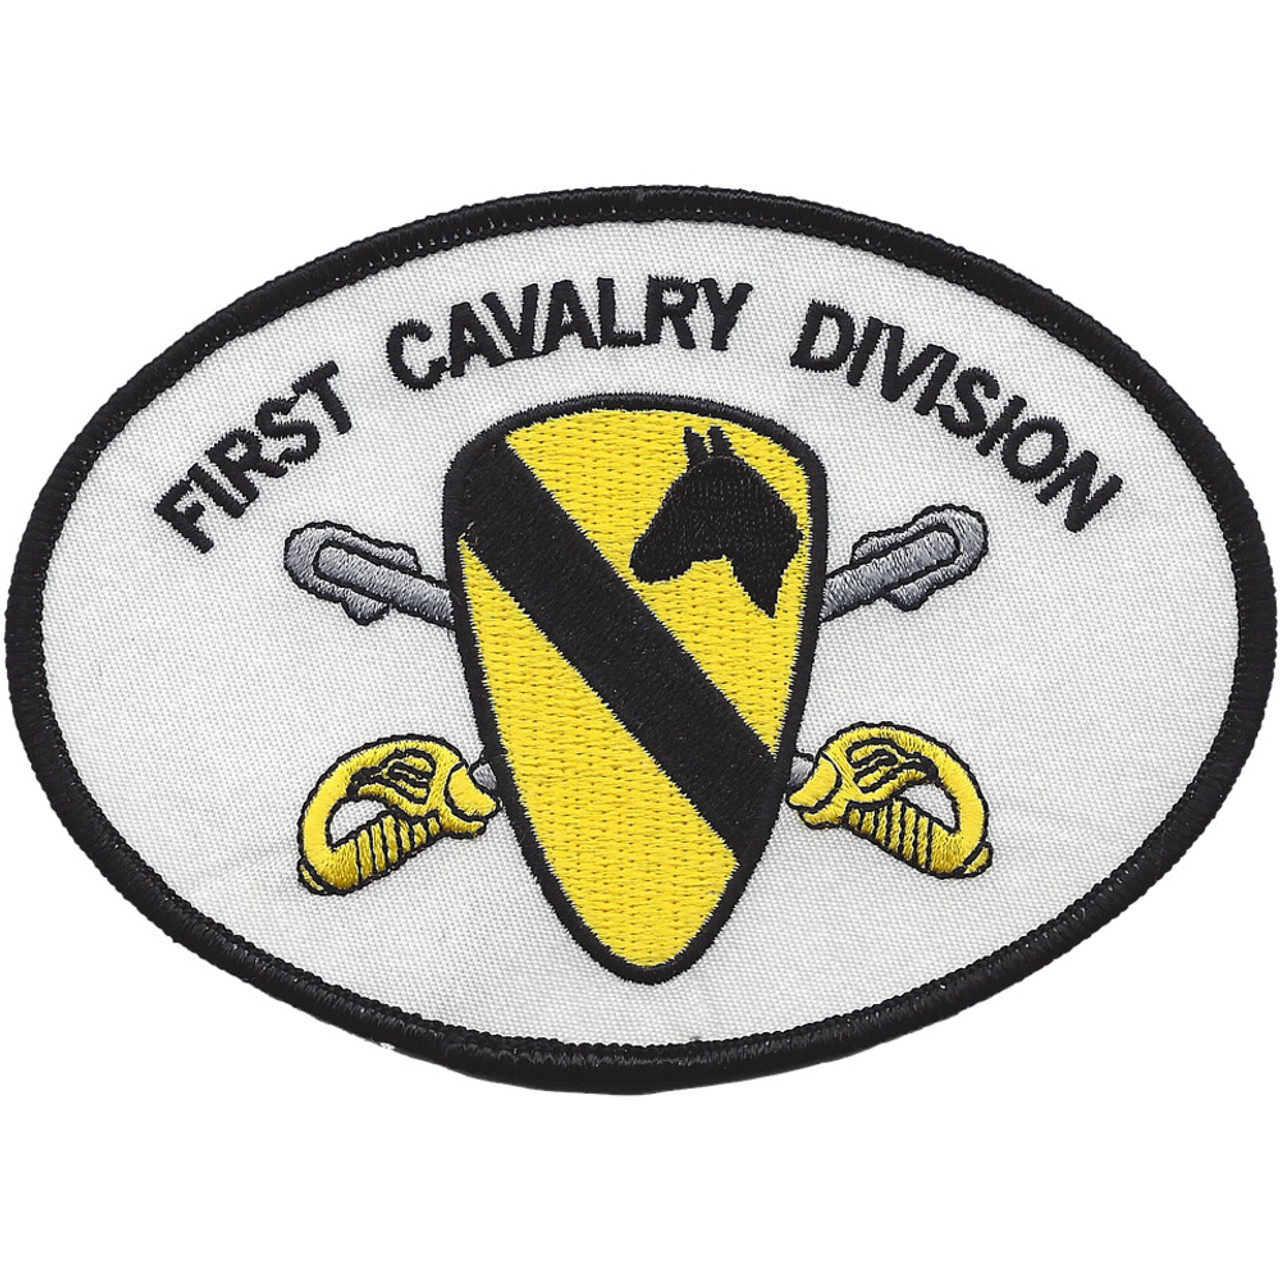 BRAND NEW VIETNAM 1ST CAVALRY ARMY MILITARY BIKER IRON ON PATCH